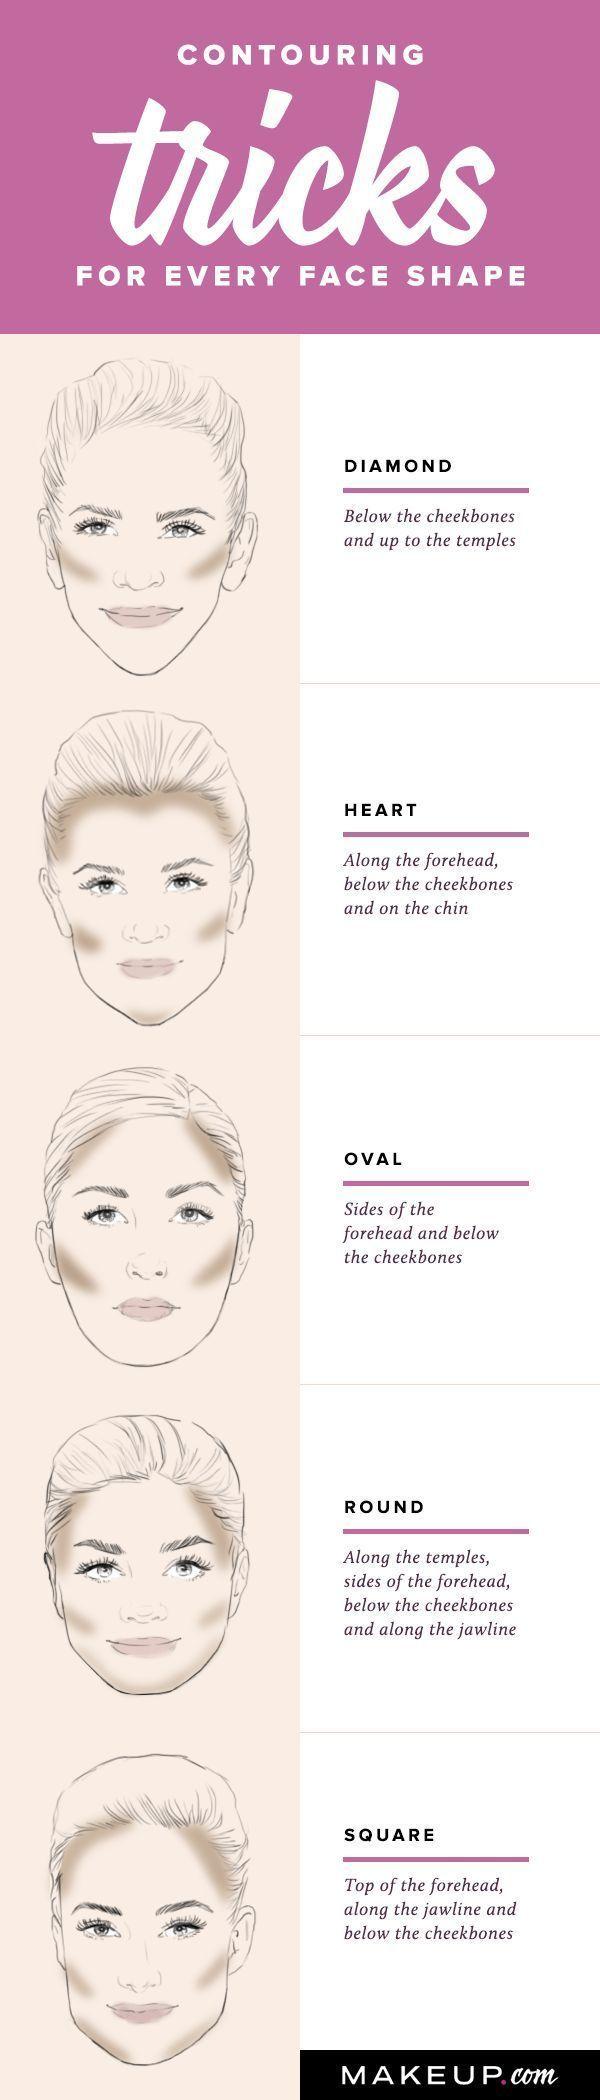 How to Contour — According to Your Face Shape    | Makeup.com by L'Oréal